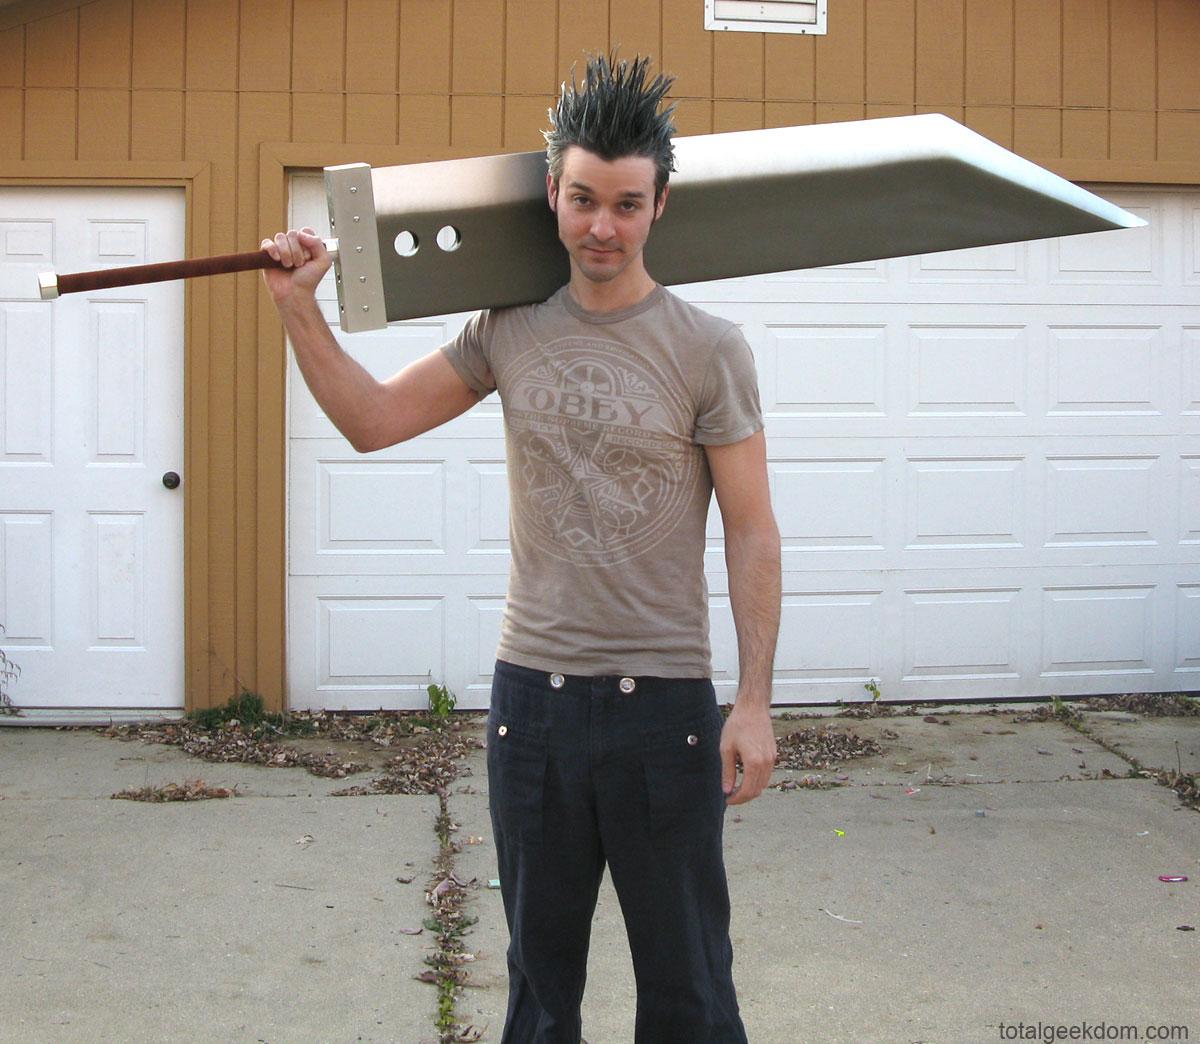 Buster Sword Full Size Replica Total Geekdom